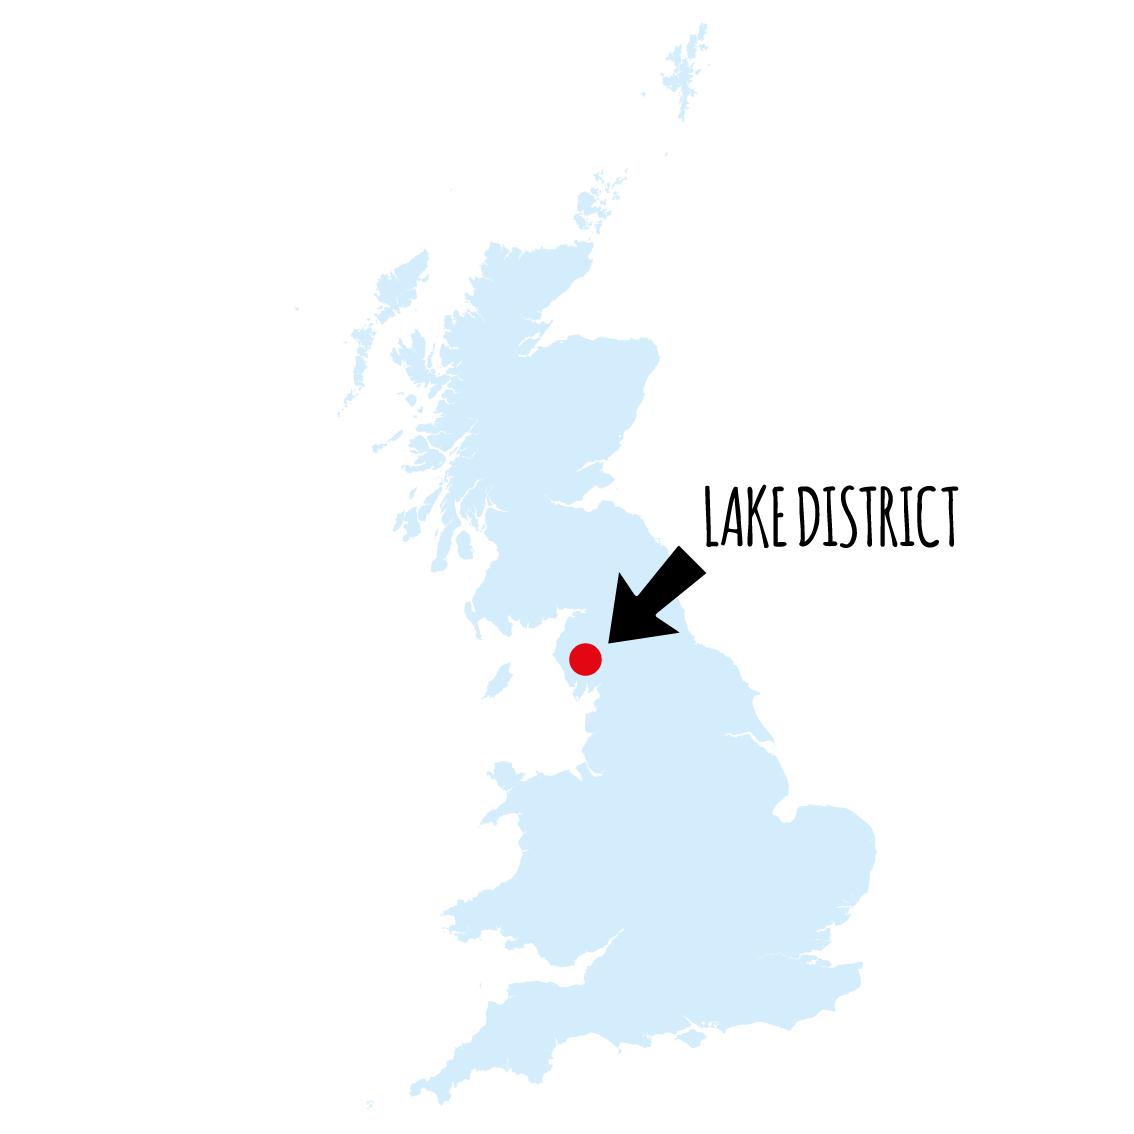 lake-district-map.png